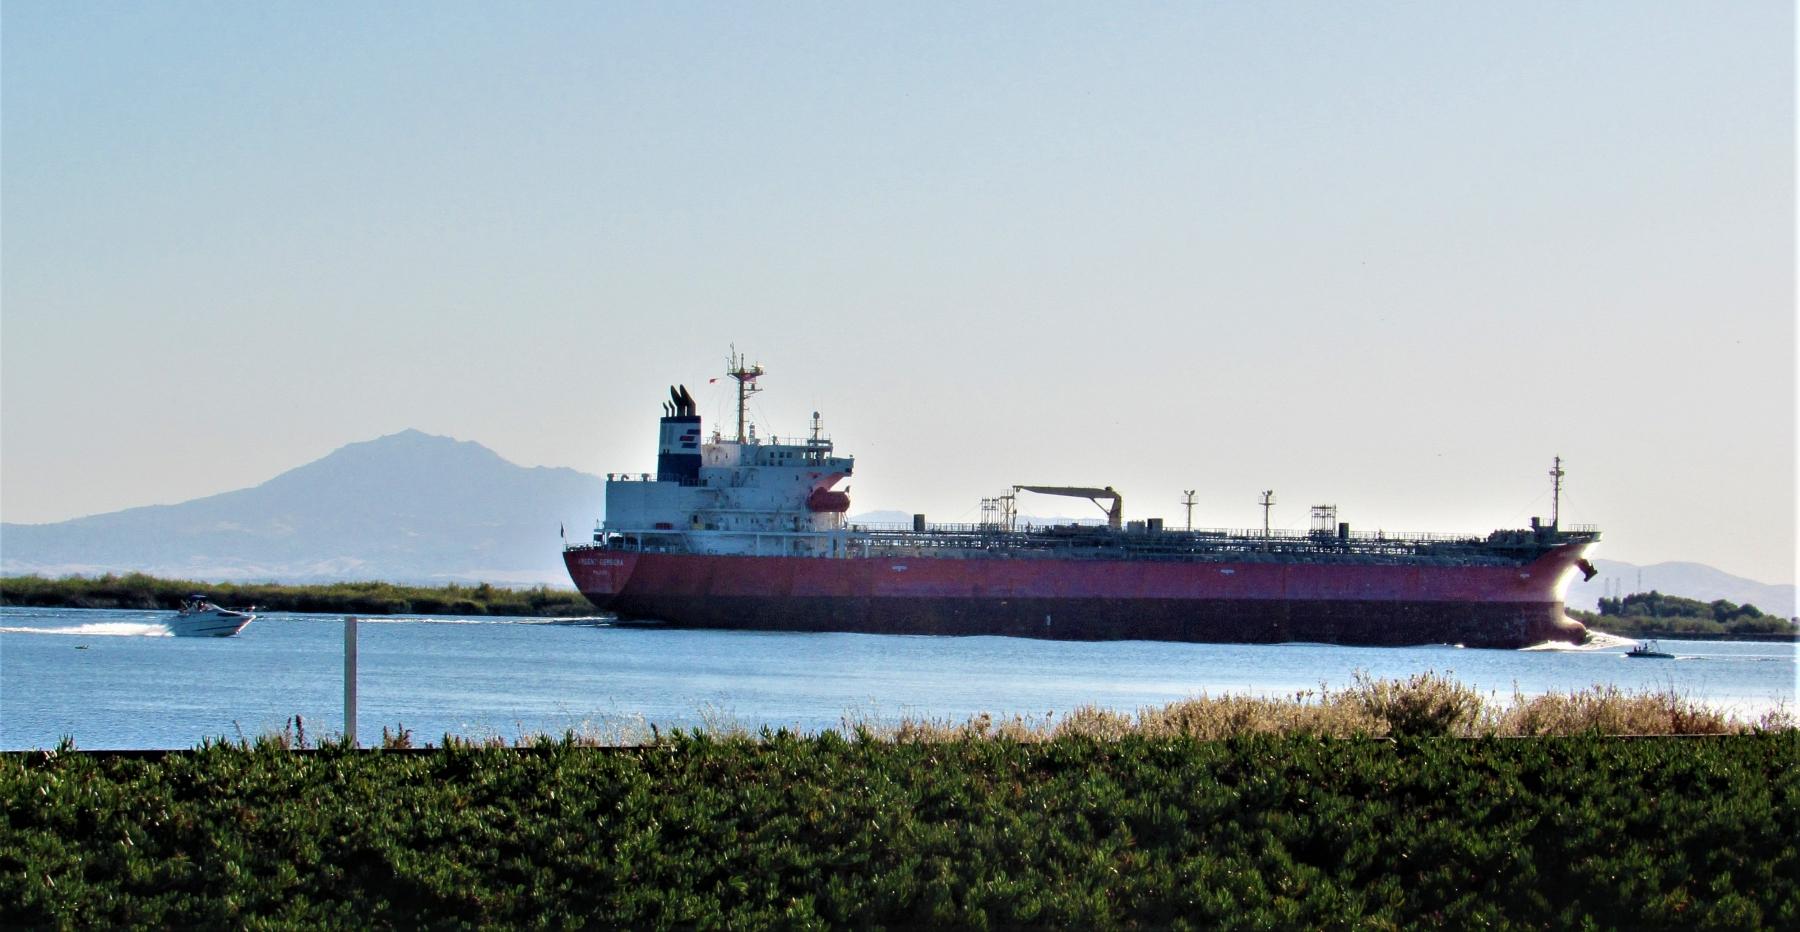 Ship-on-the-San-Joaquin